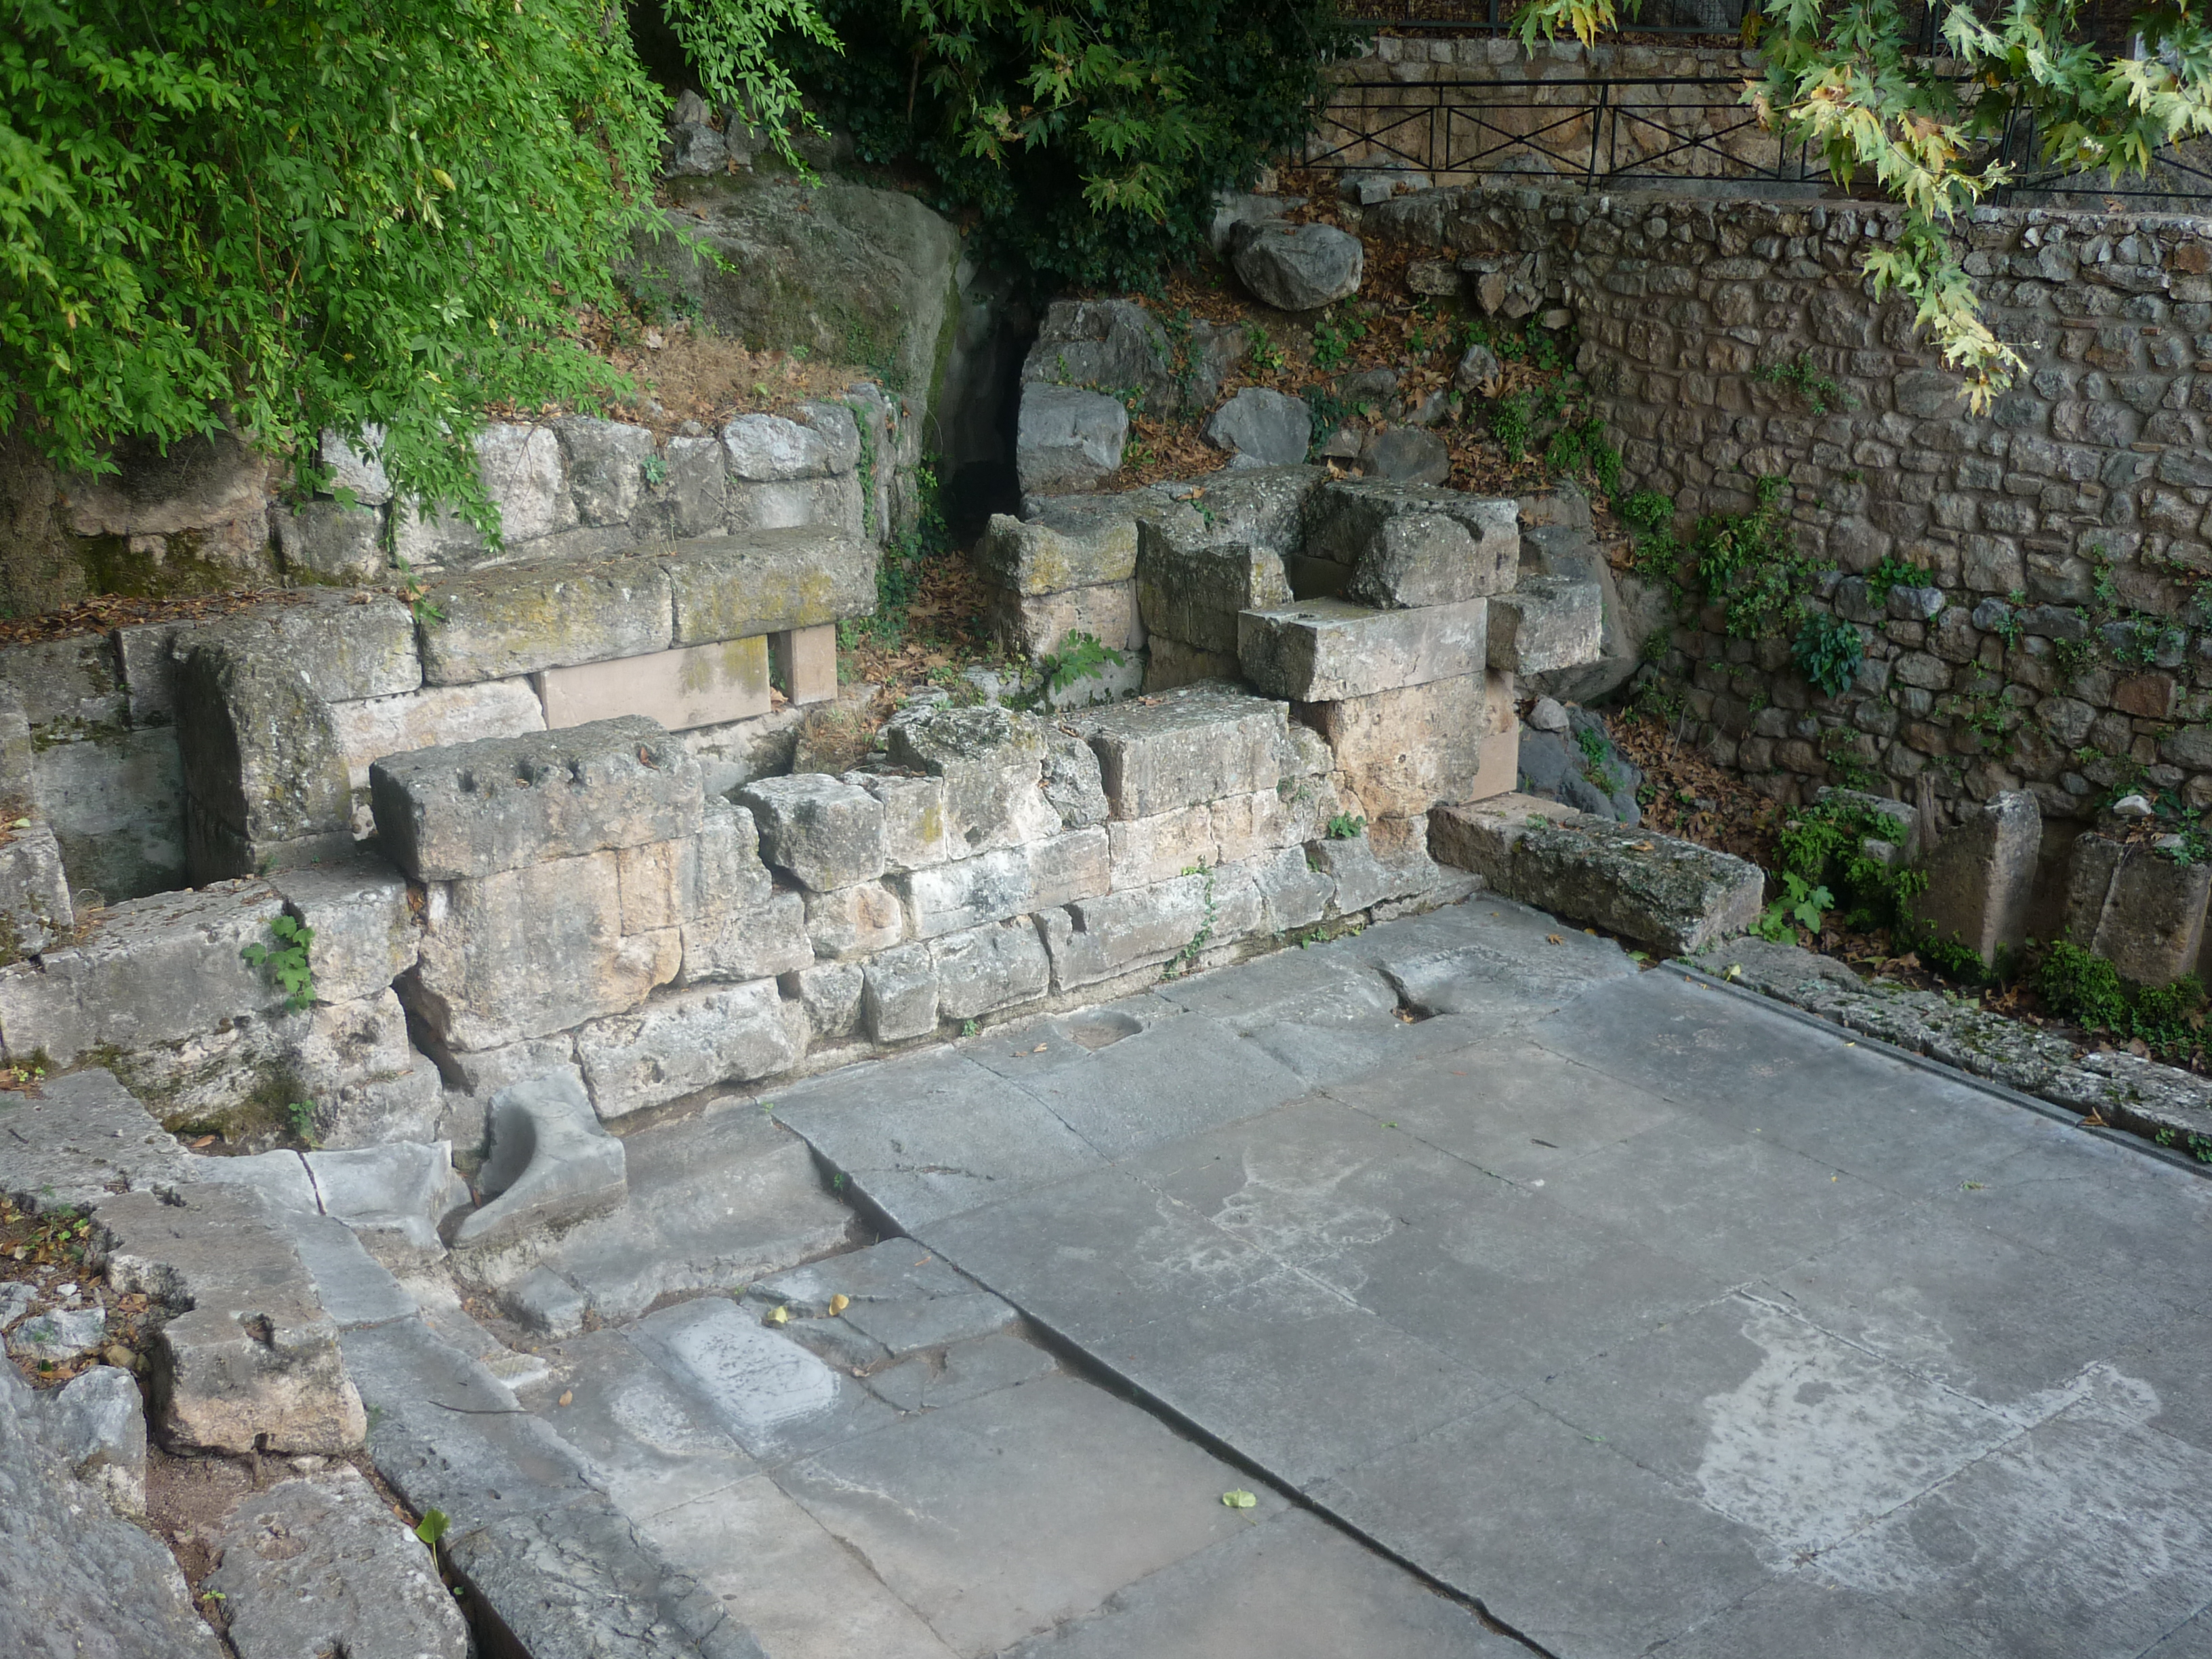 File:DelphiSpringArchaic.JPG - Wikimedia Commons